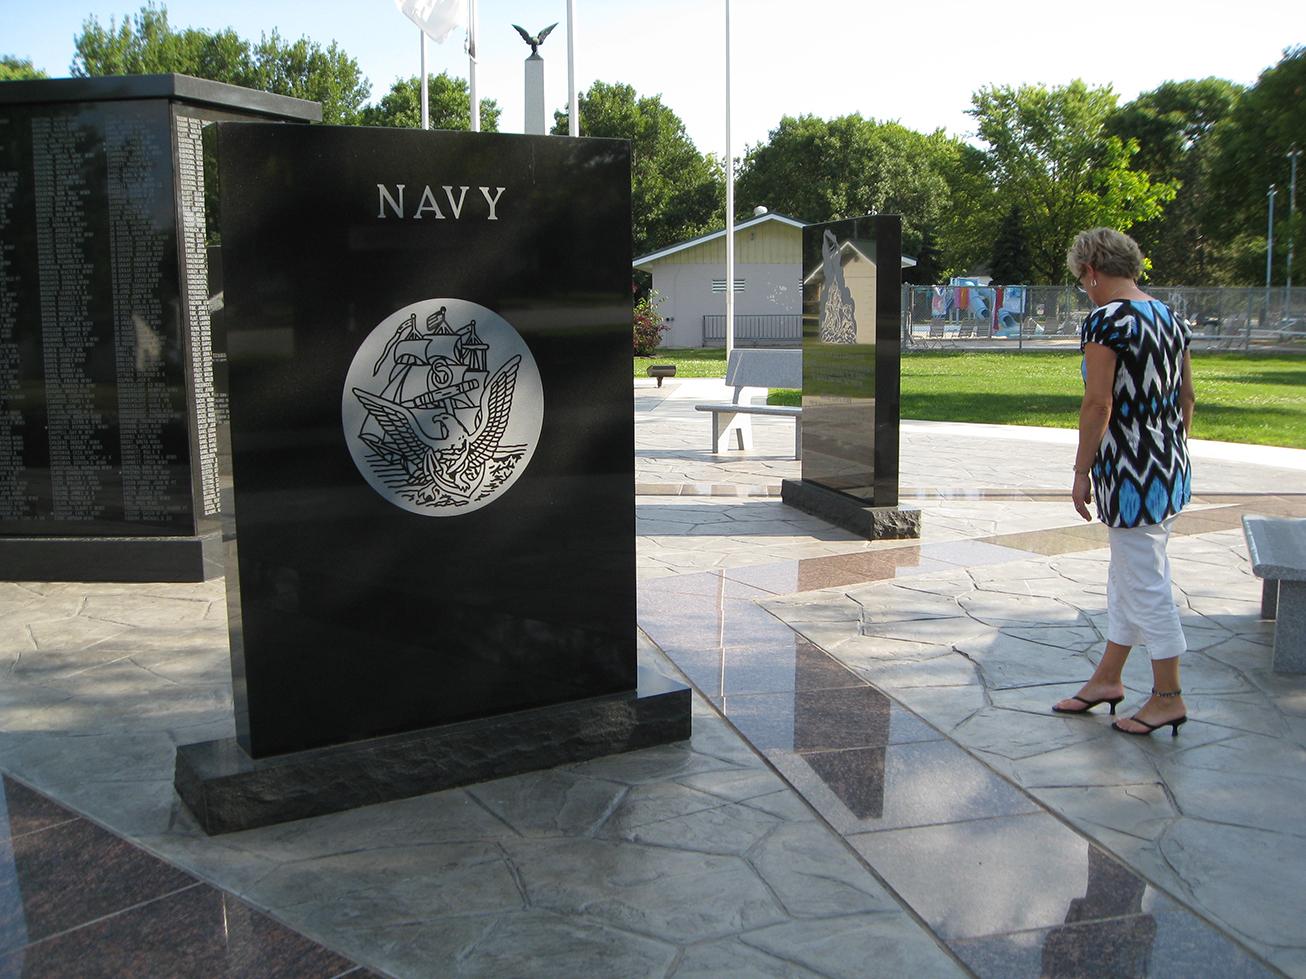 Navy2009